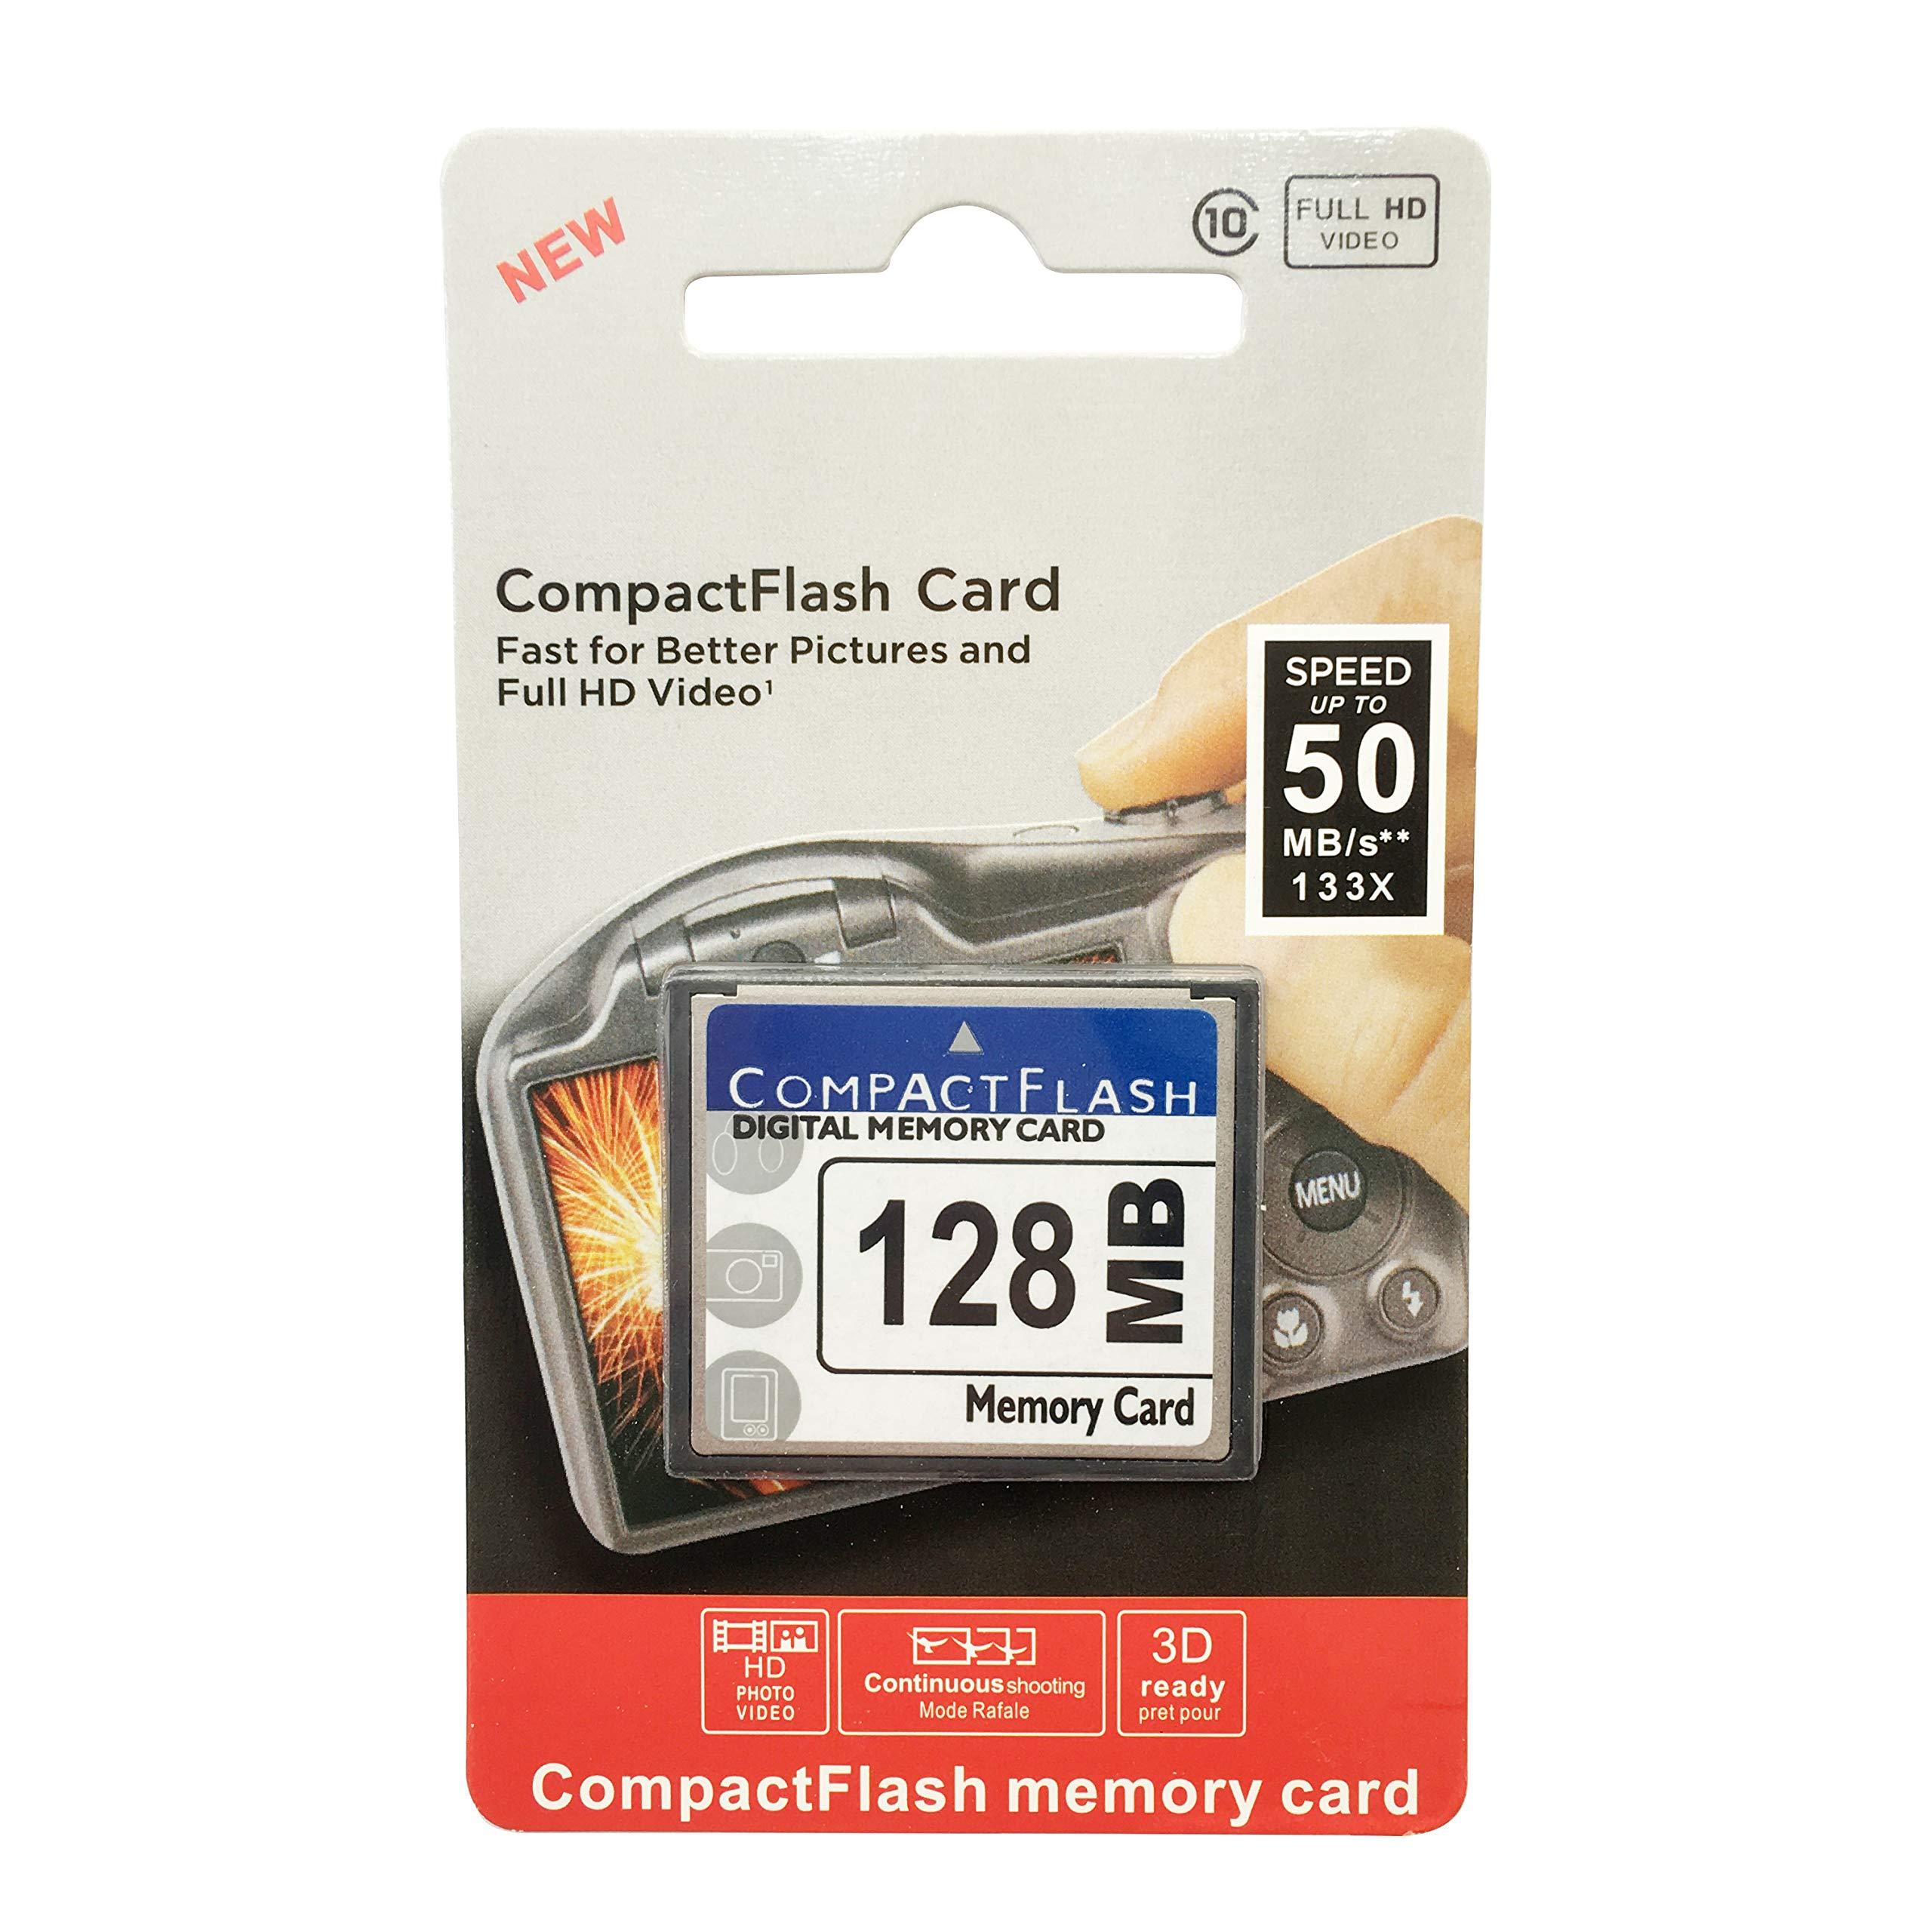 Bodawei Ogrinal Compact Flash Card Industrial Grade SLC Nand 128MB camera card 128mb